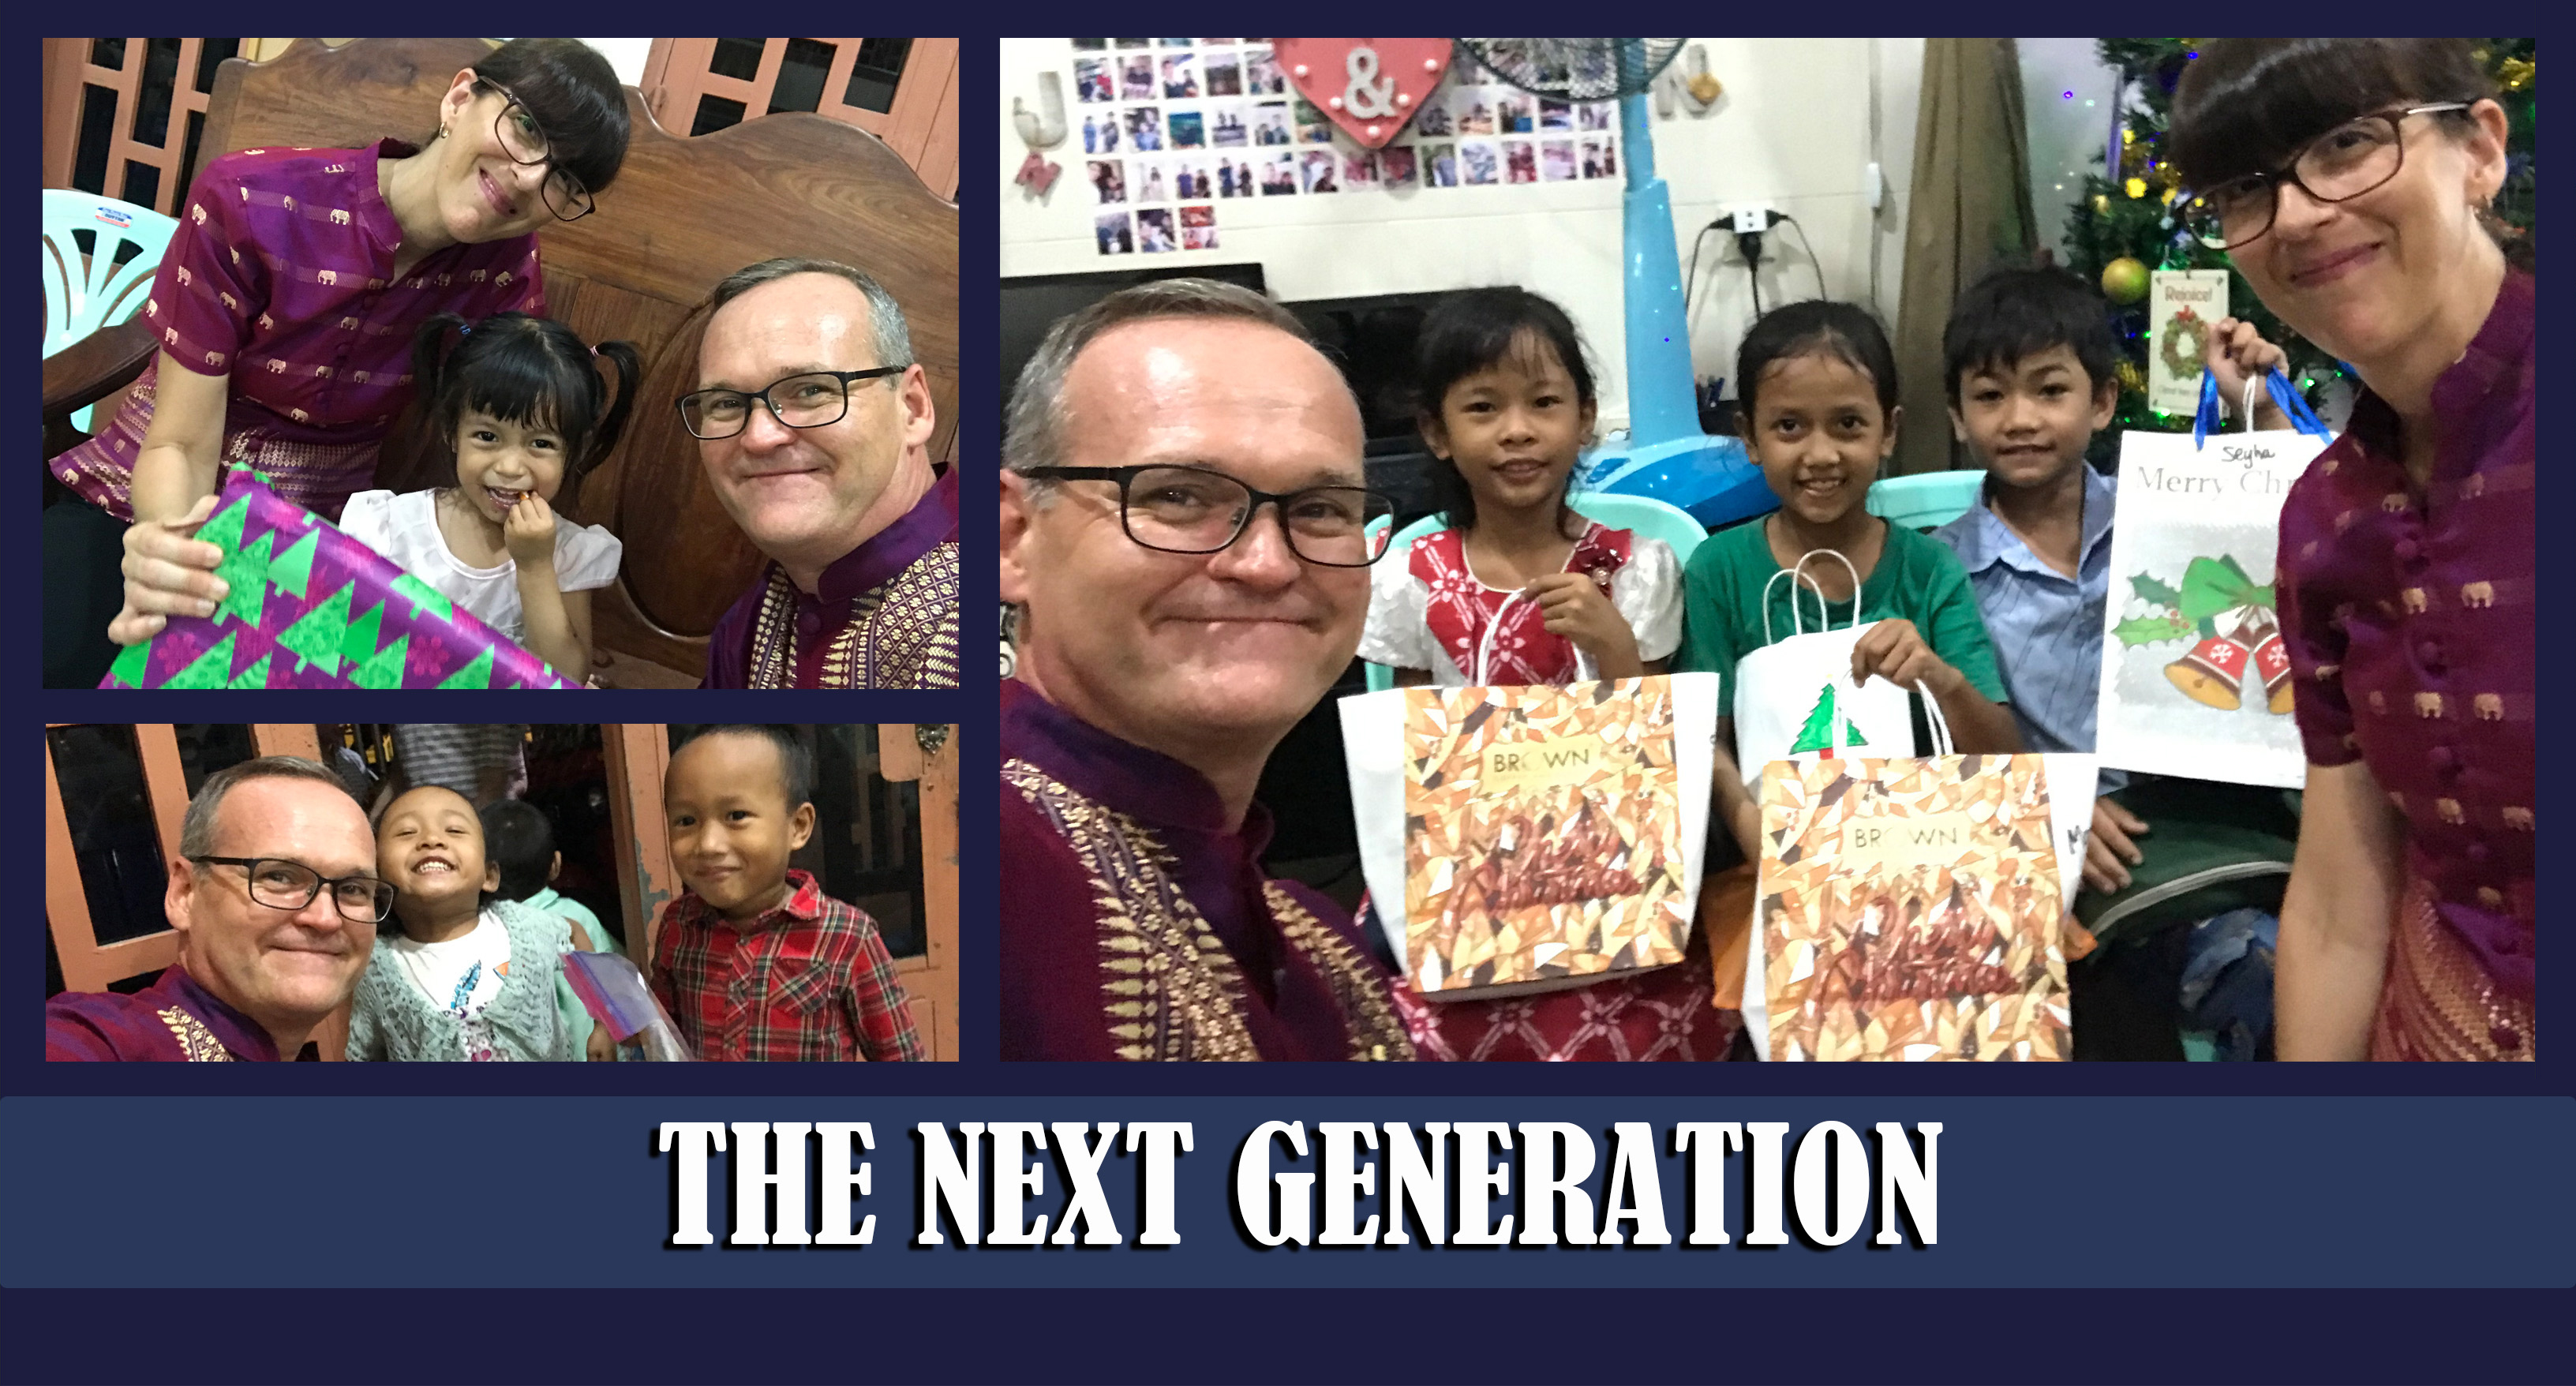 12.31.19 NEXT GENERATION